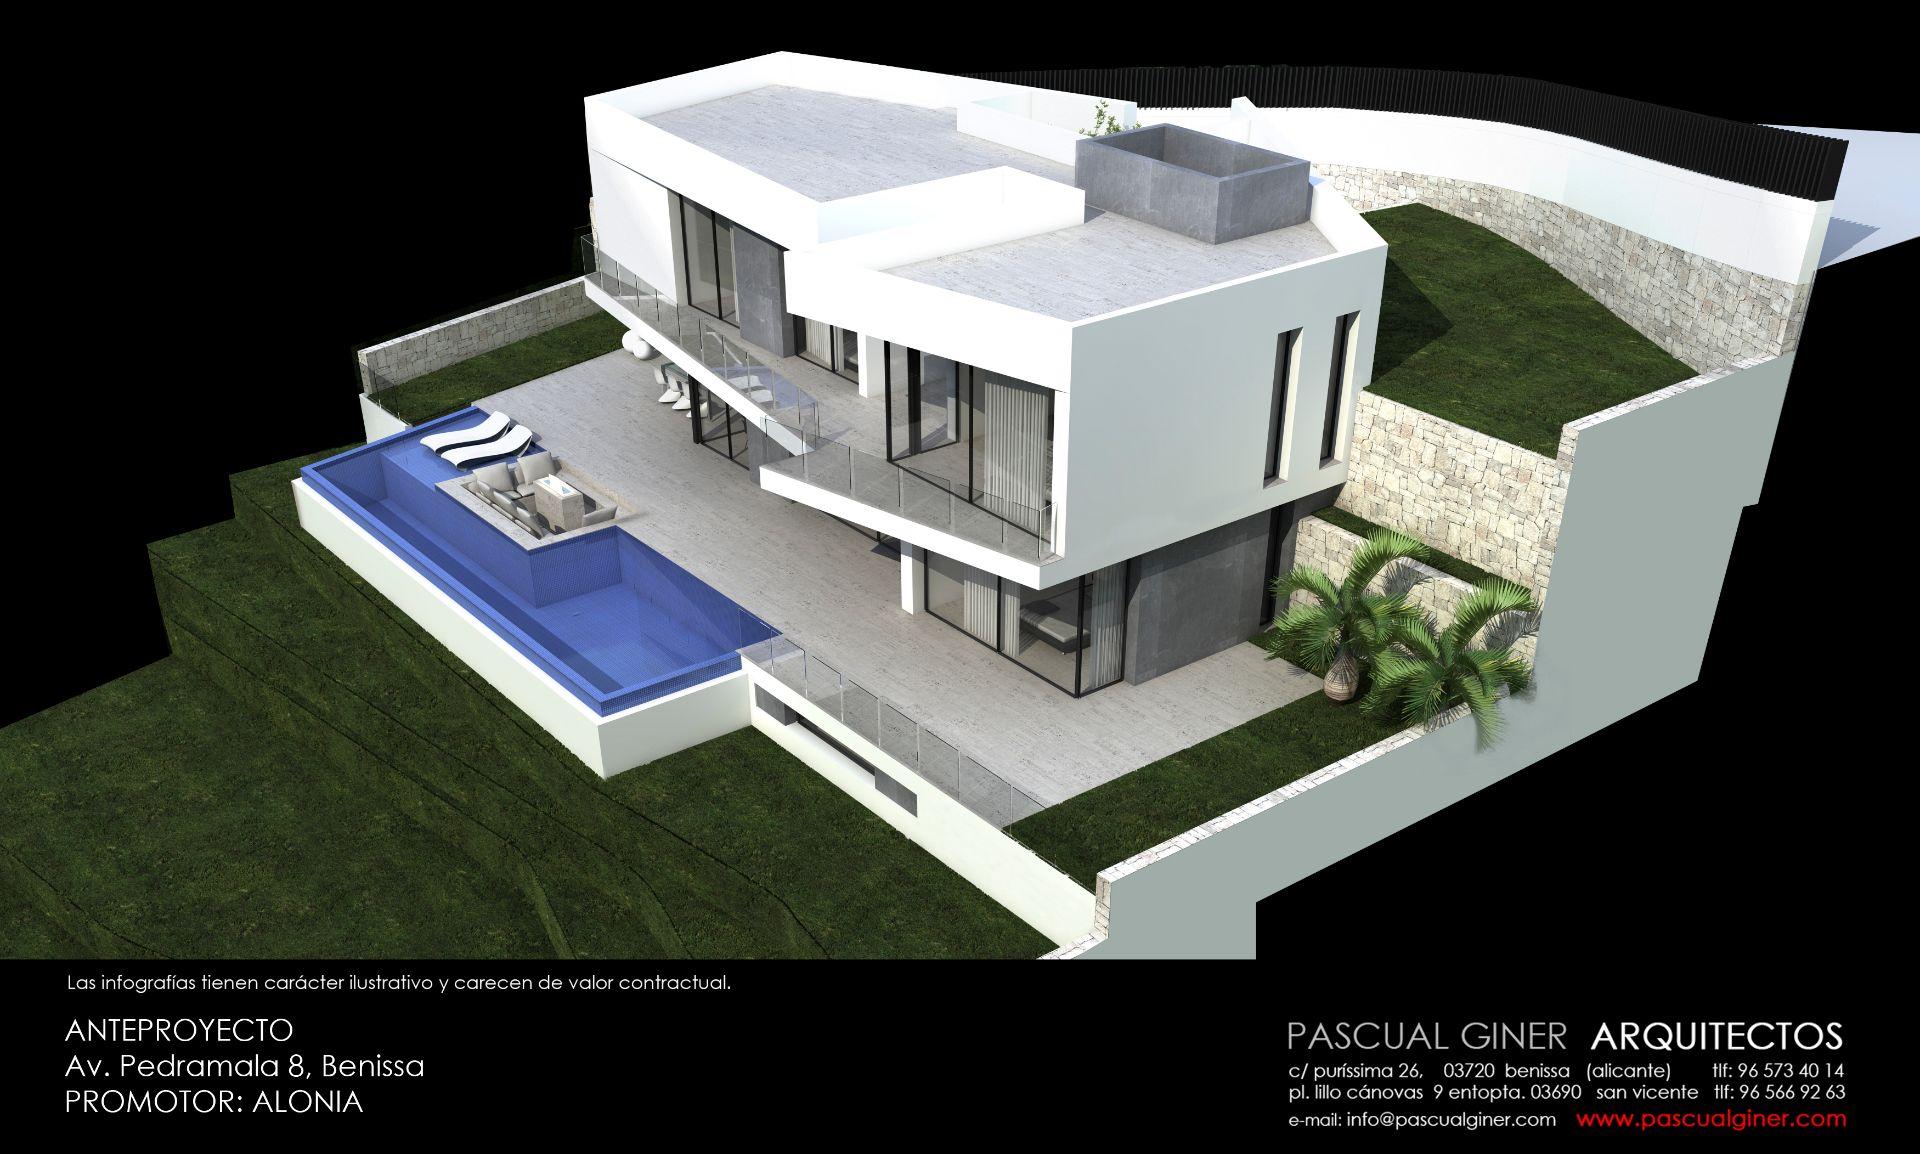 Casa / Chalet en Benissa, Pedramala, venta